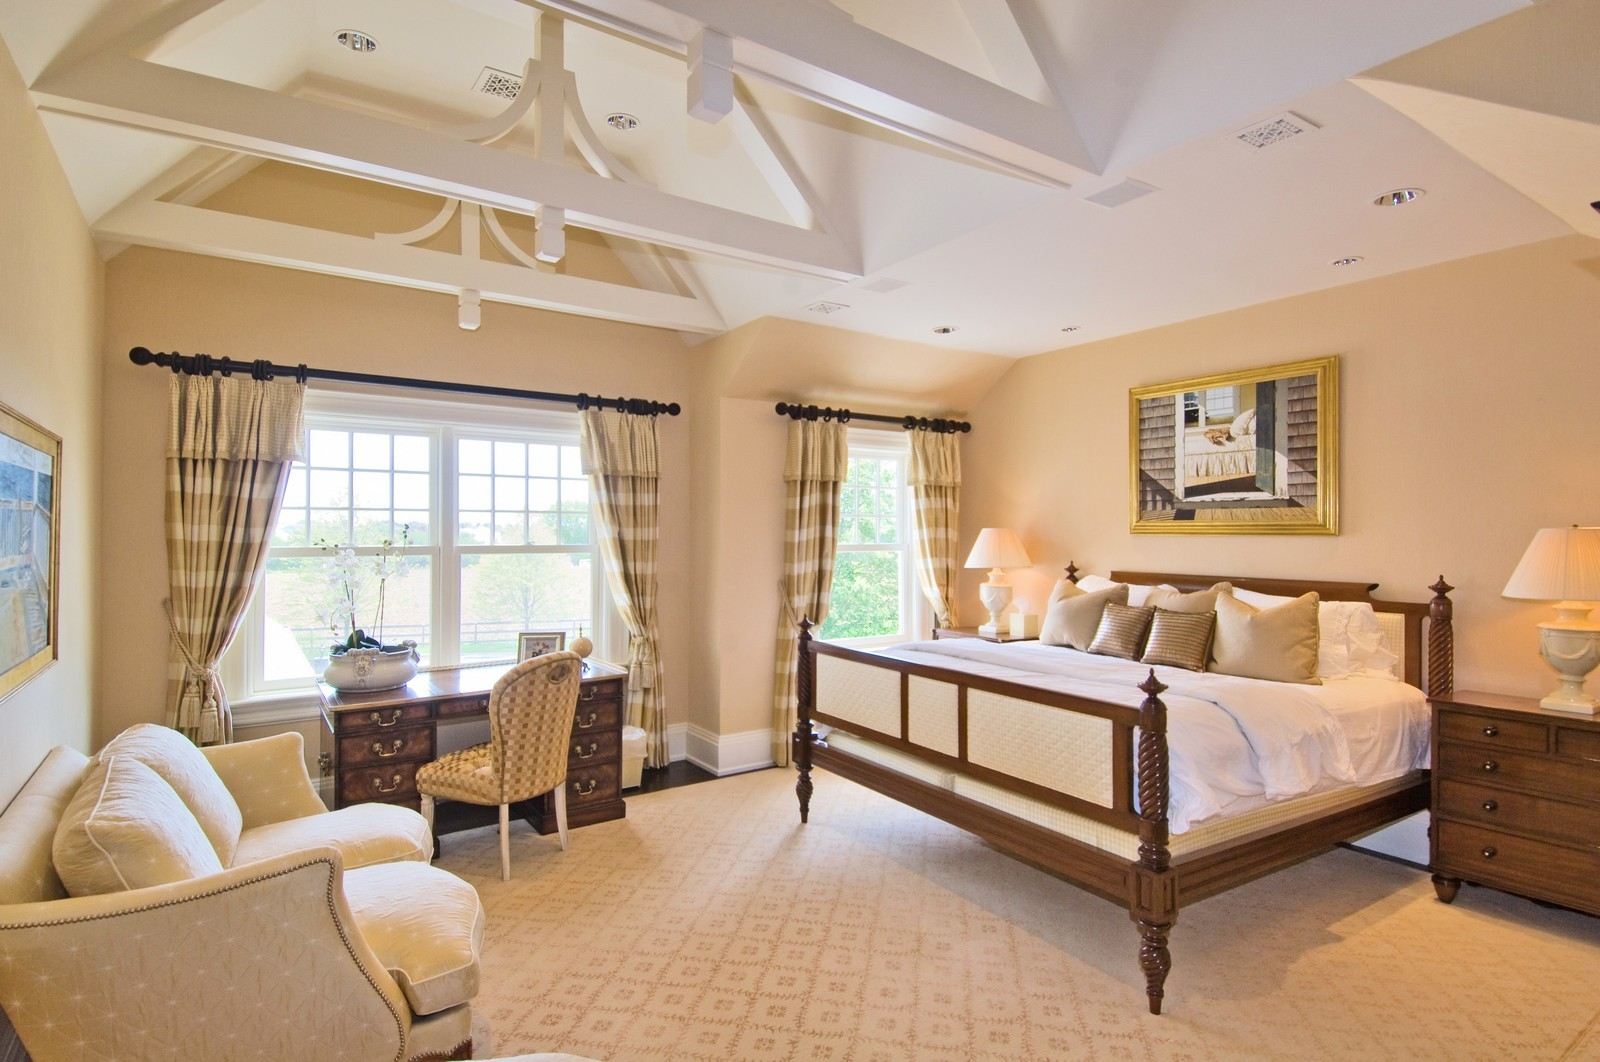 Real Estate Photography - 612 halsey lane, bridgehampton, NY, 11932 - Bedroom